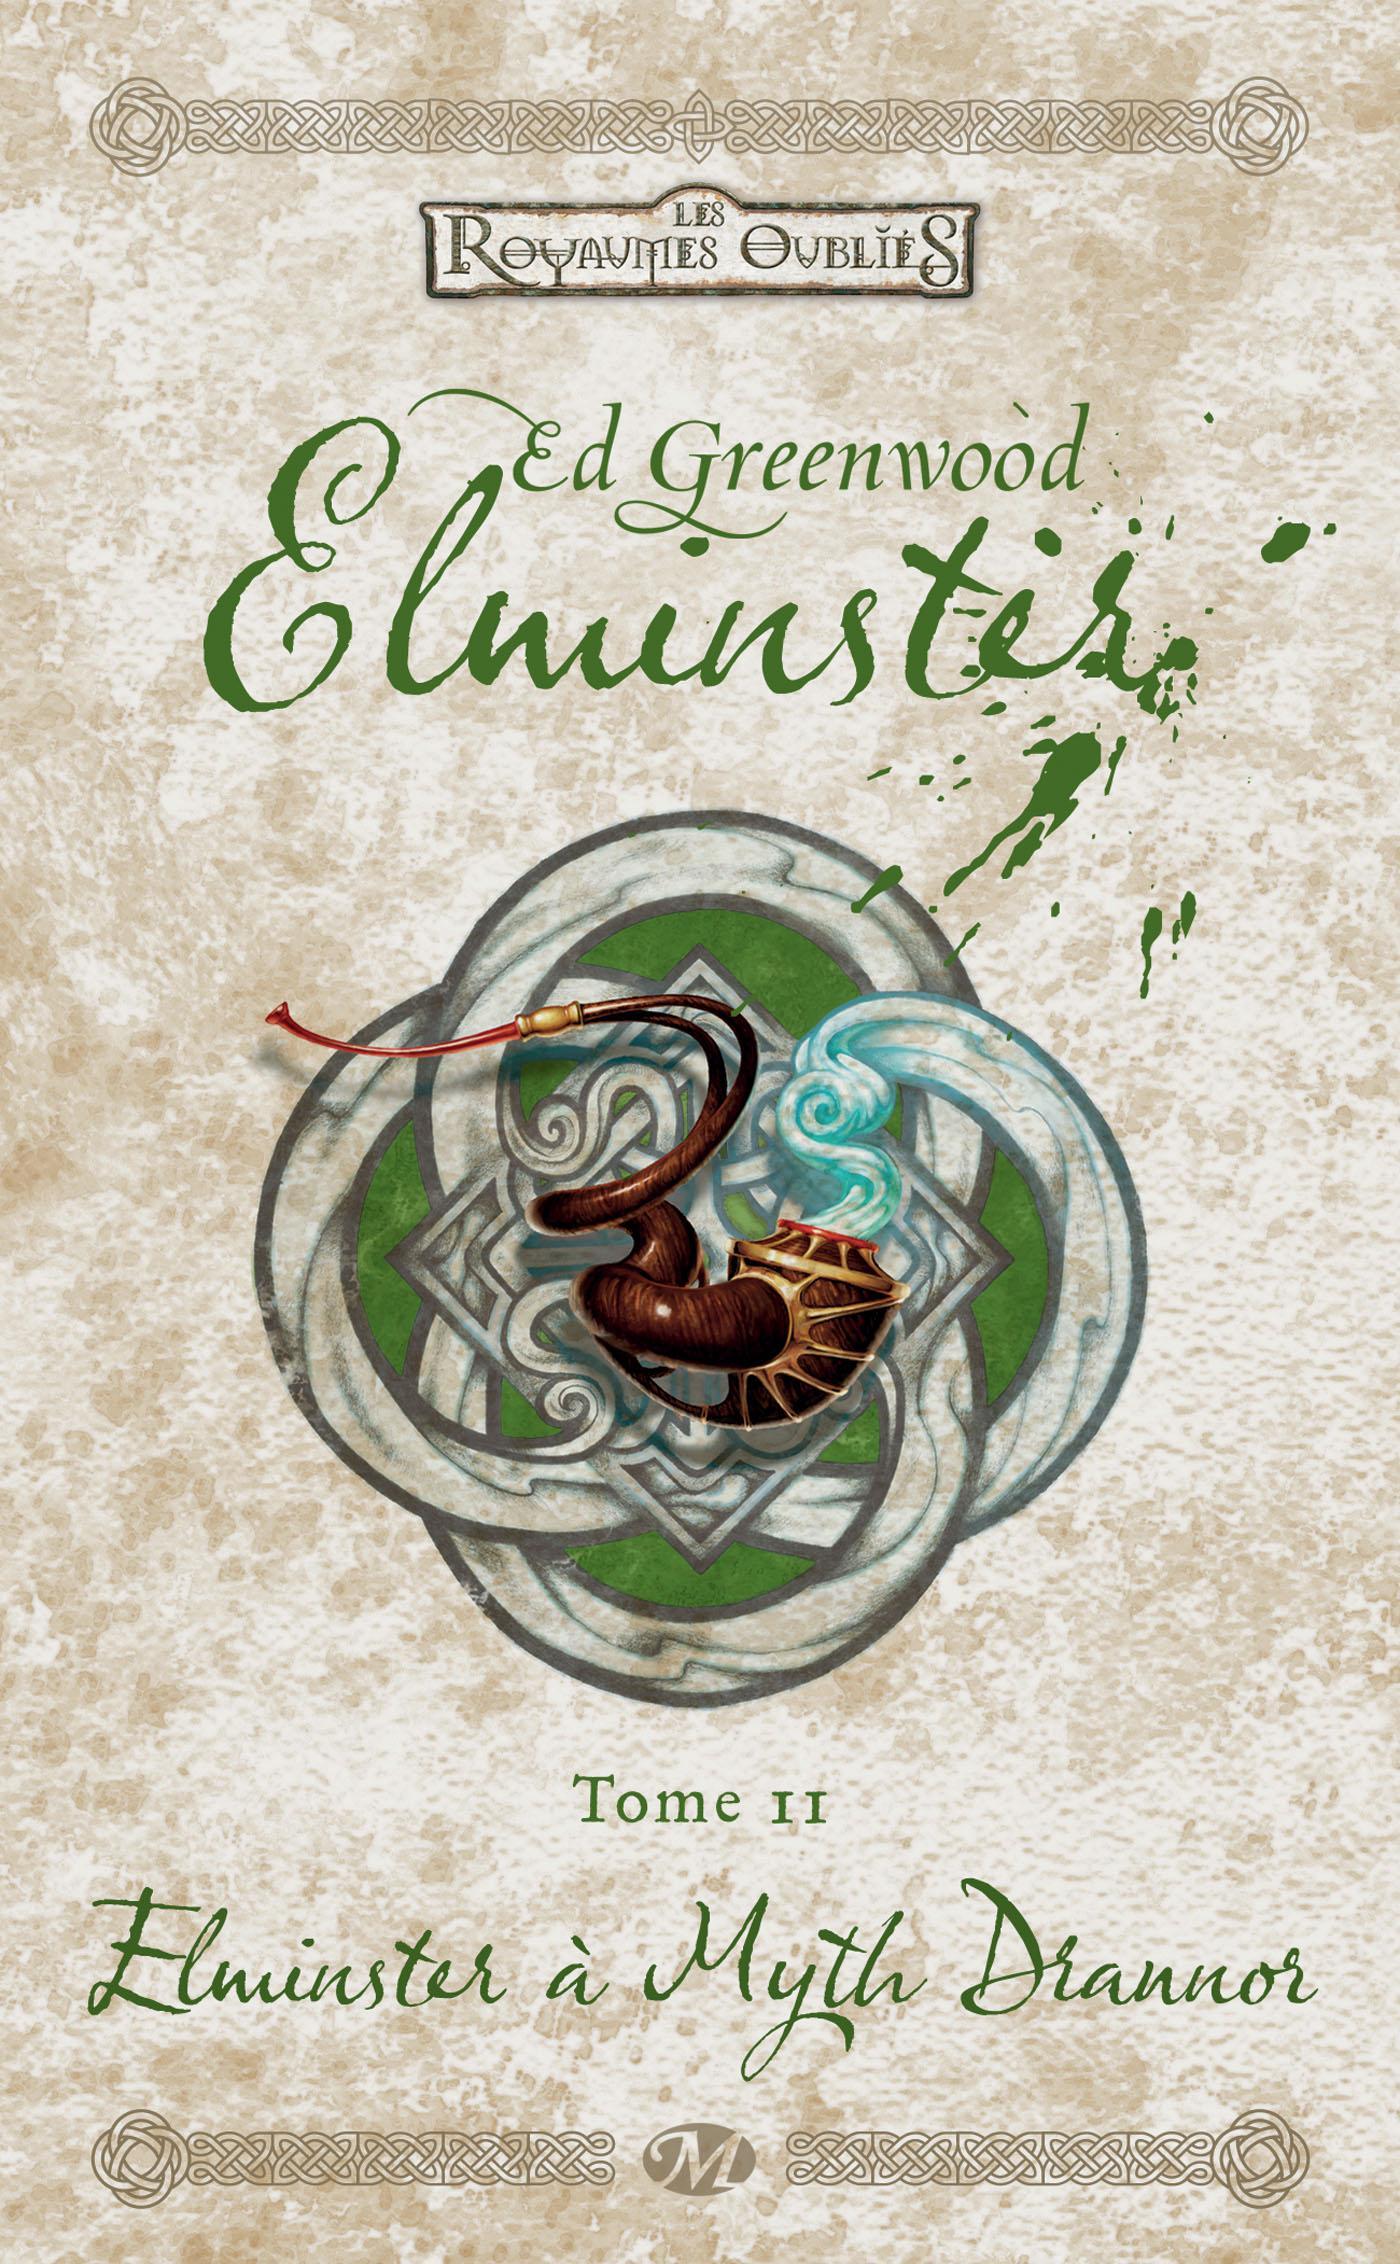 Elminster à Myth Drannor, ELMINSTER, T2